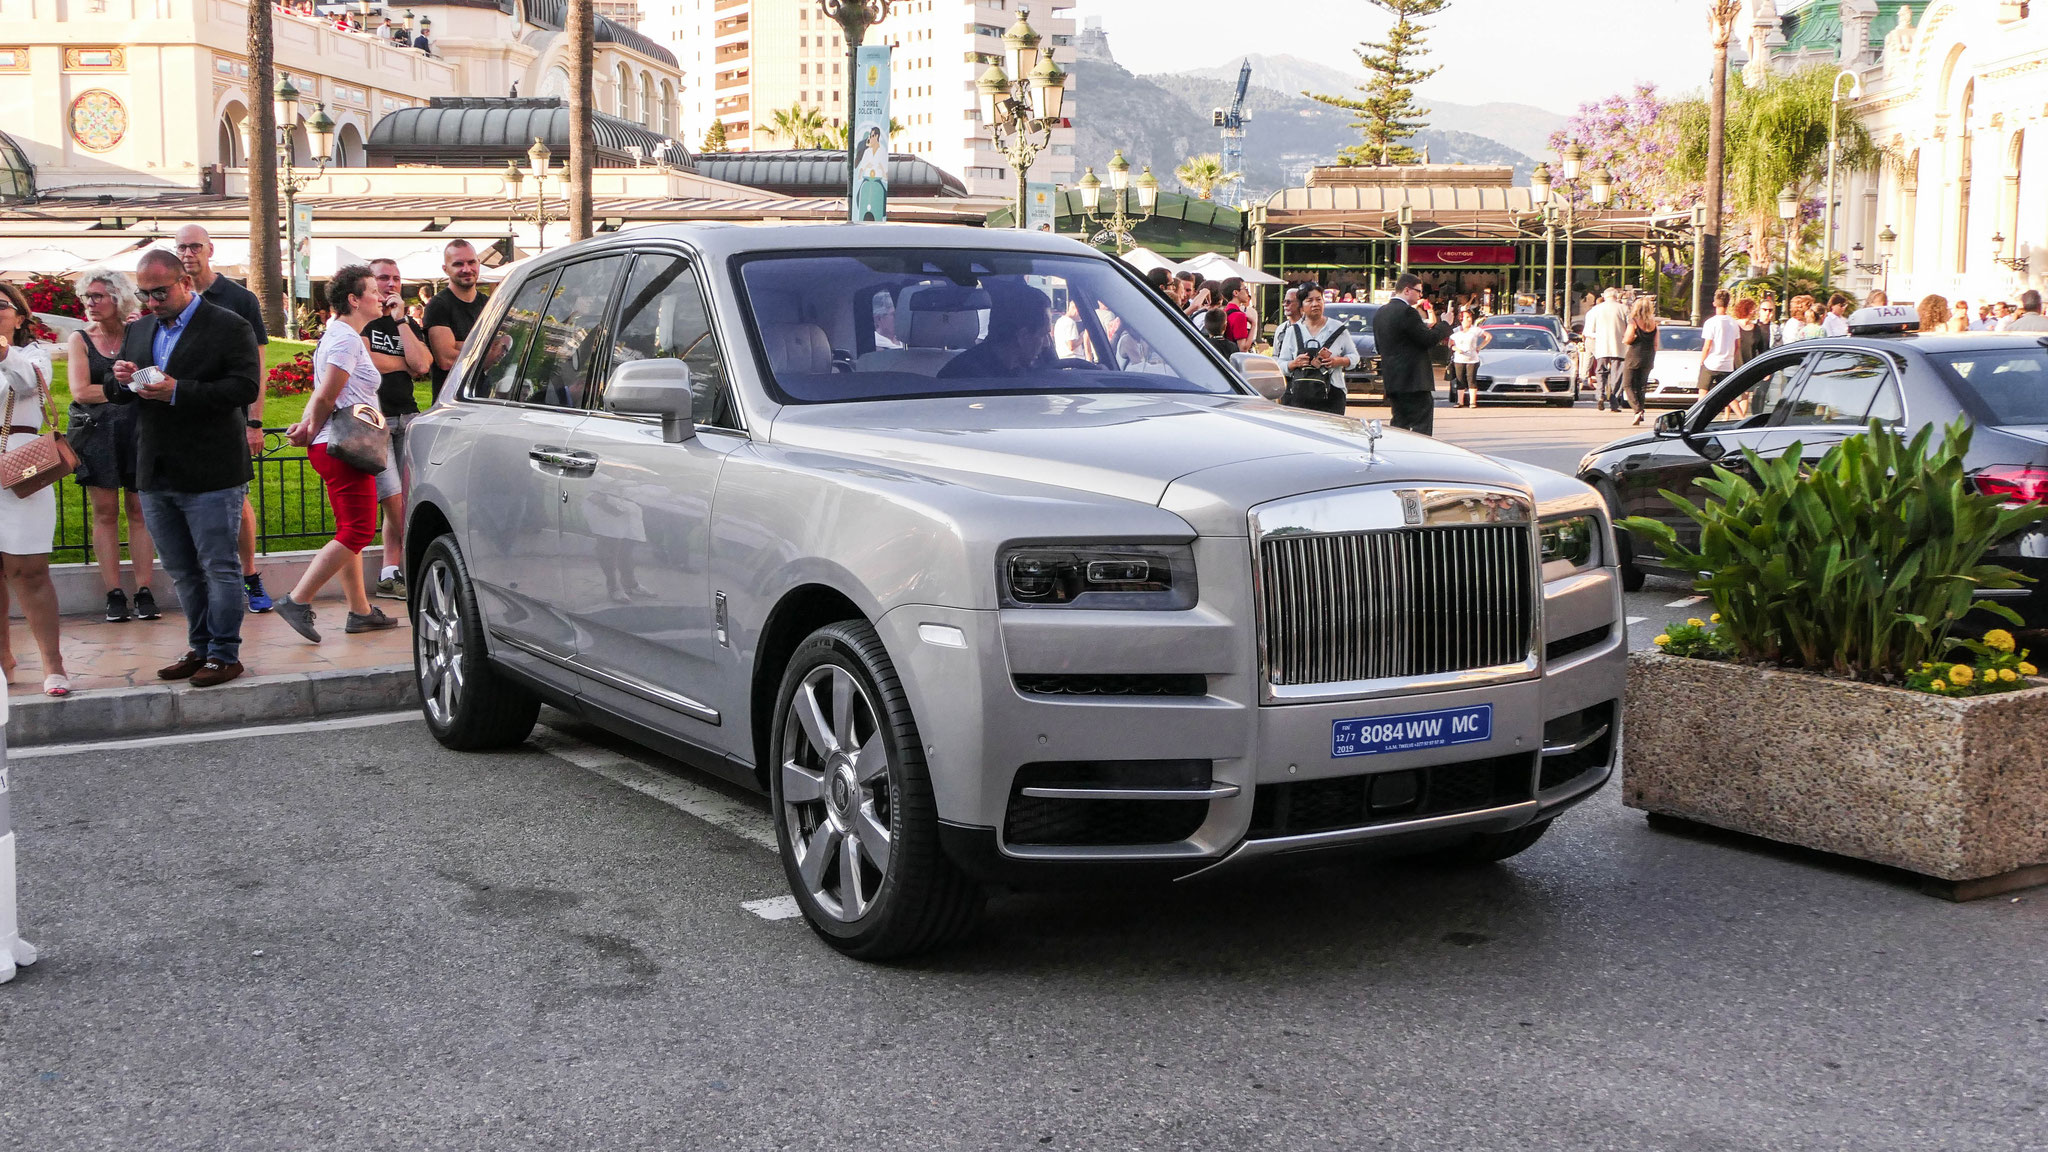 Rolls Royce Cullinan - 8084-WW-MC (MC)